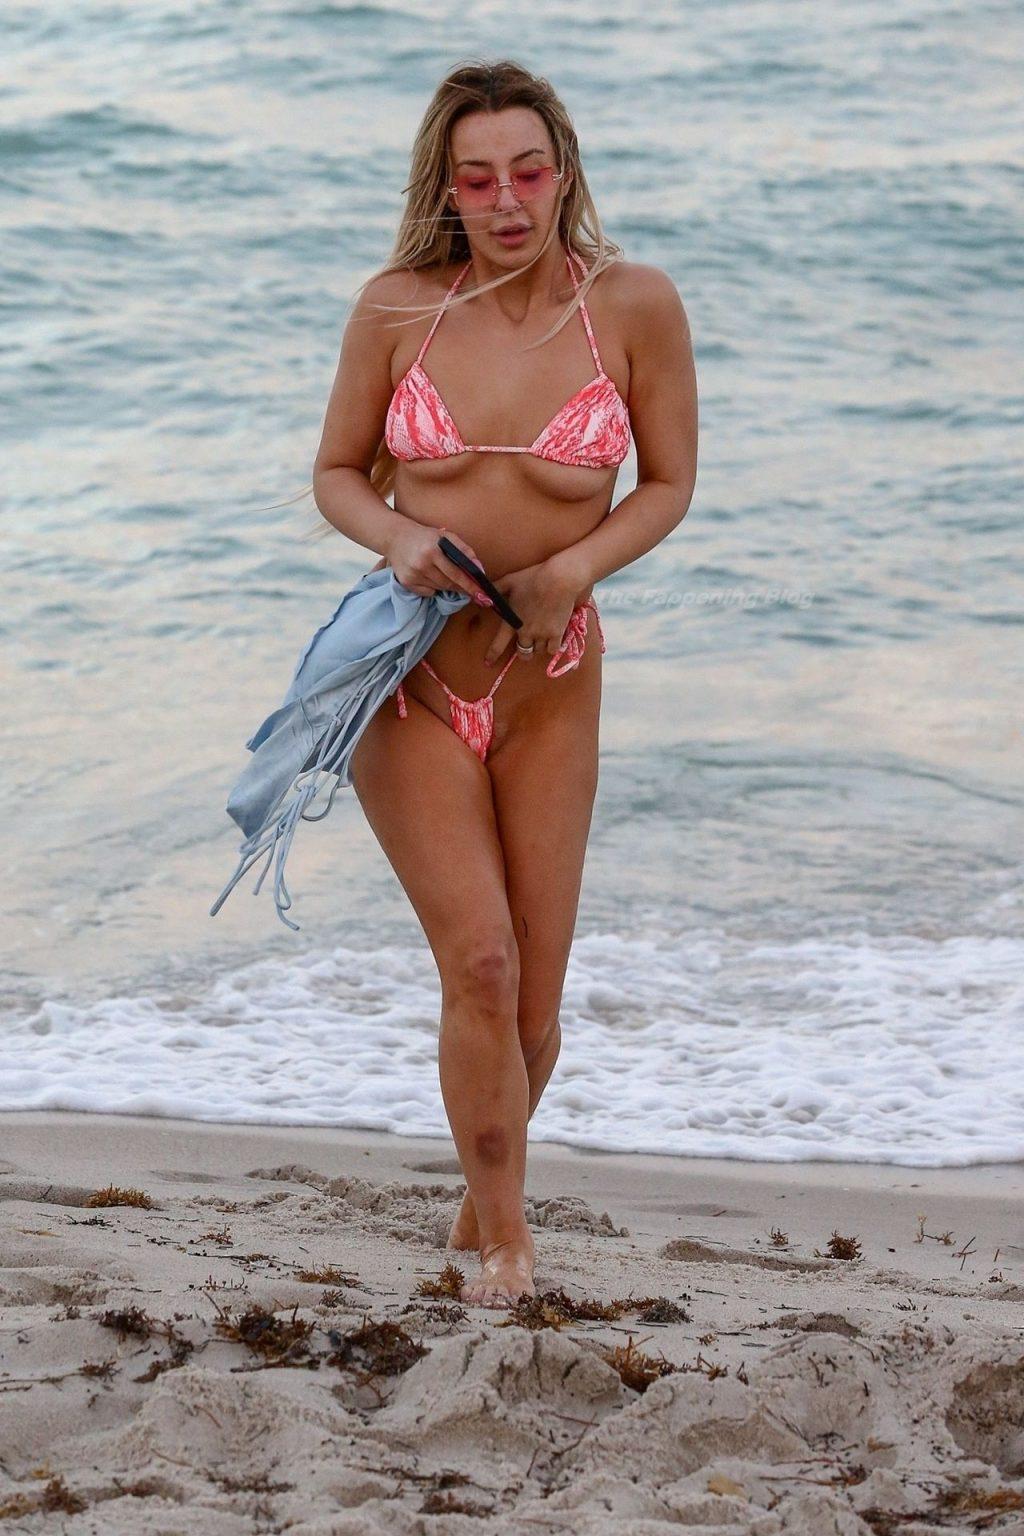 Tana Mongeau Has Fun Snapping Selfies with Friends in Miami Beach (189 Photos)